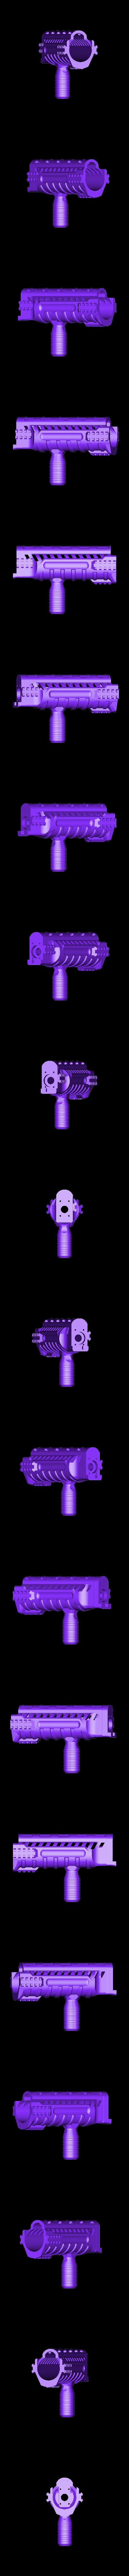 UNW_Long_shroud_NR_MID_V2_grip.stl Download free STL file FGC 9 UNW No rail Long and medium Shroud • 3D printer model, UntangleART